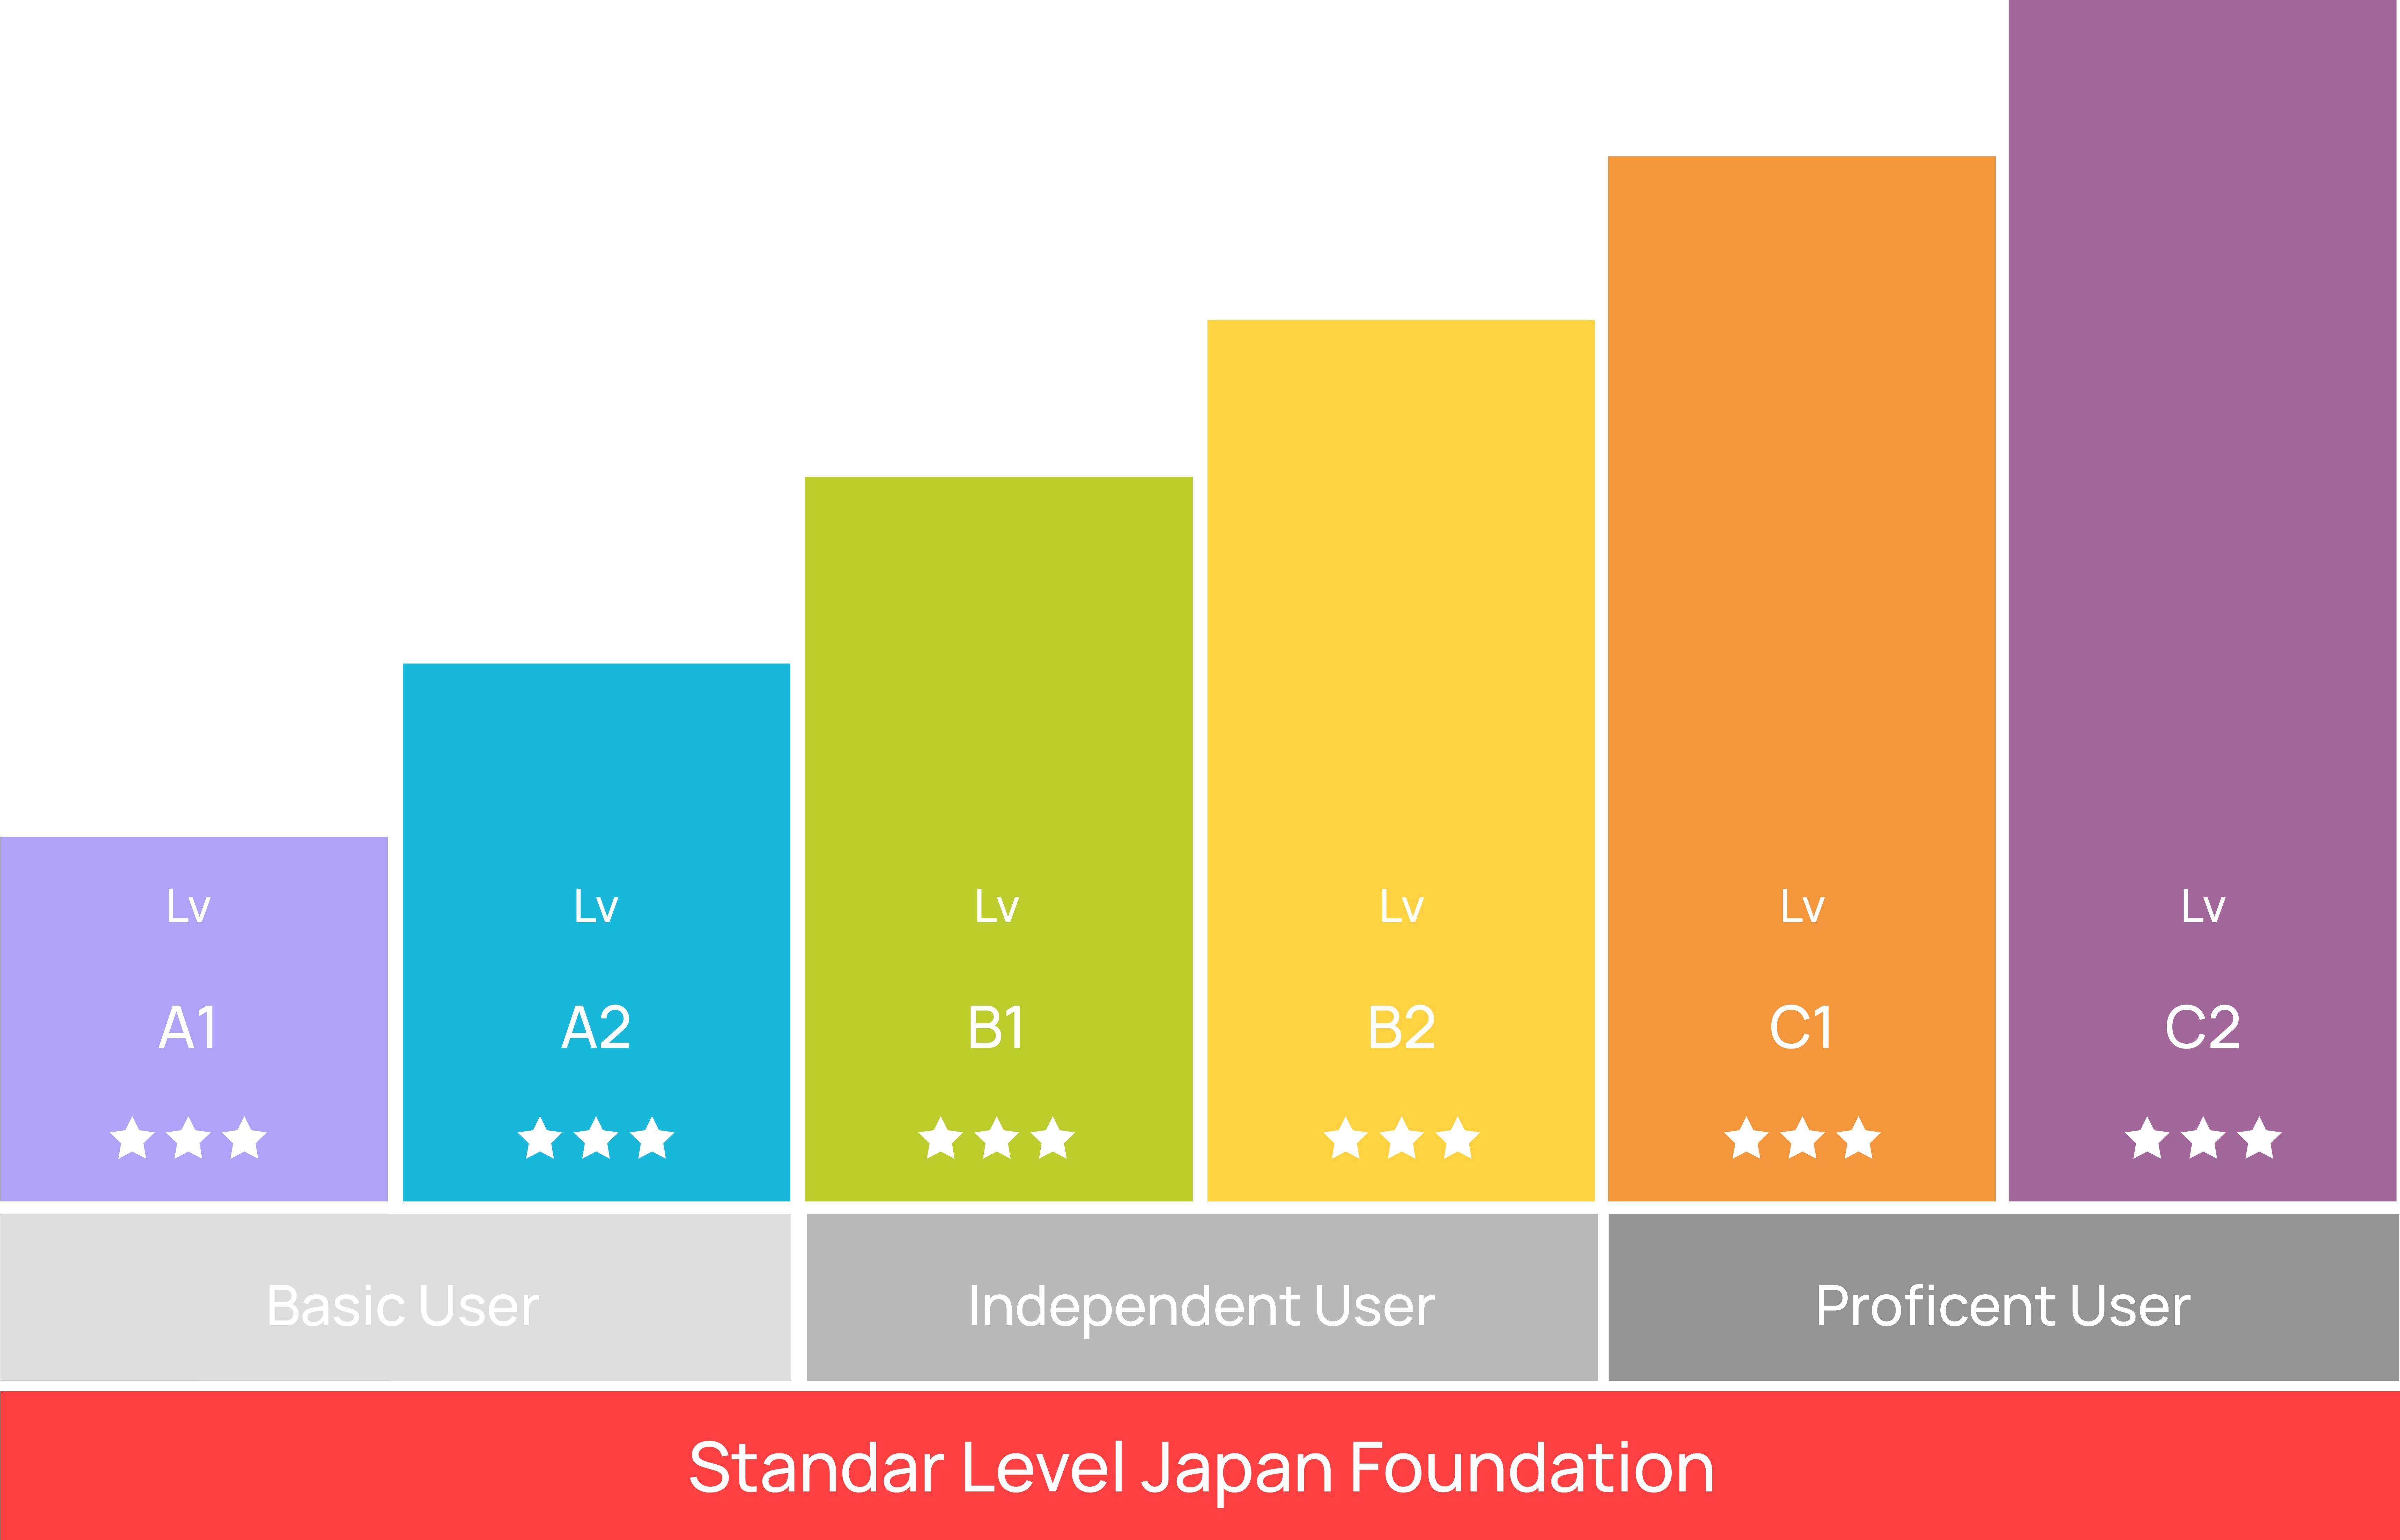 Tingkatan Level Kursus Bahasa Jepang Junior (Age < 15)